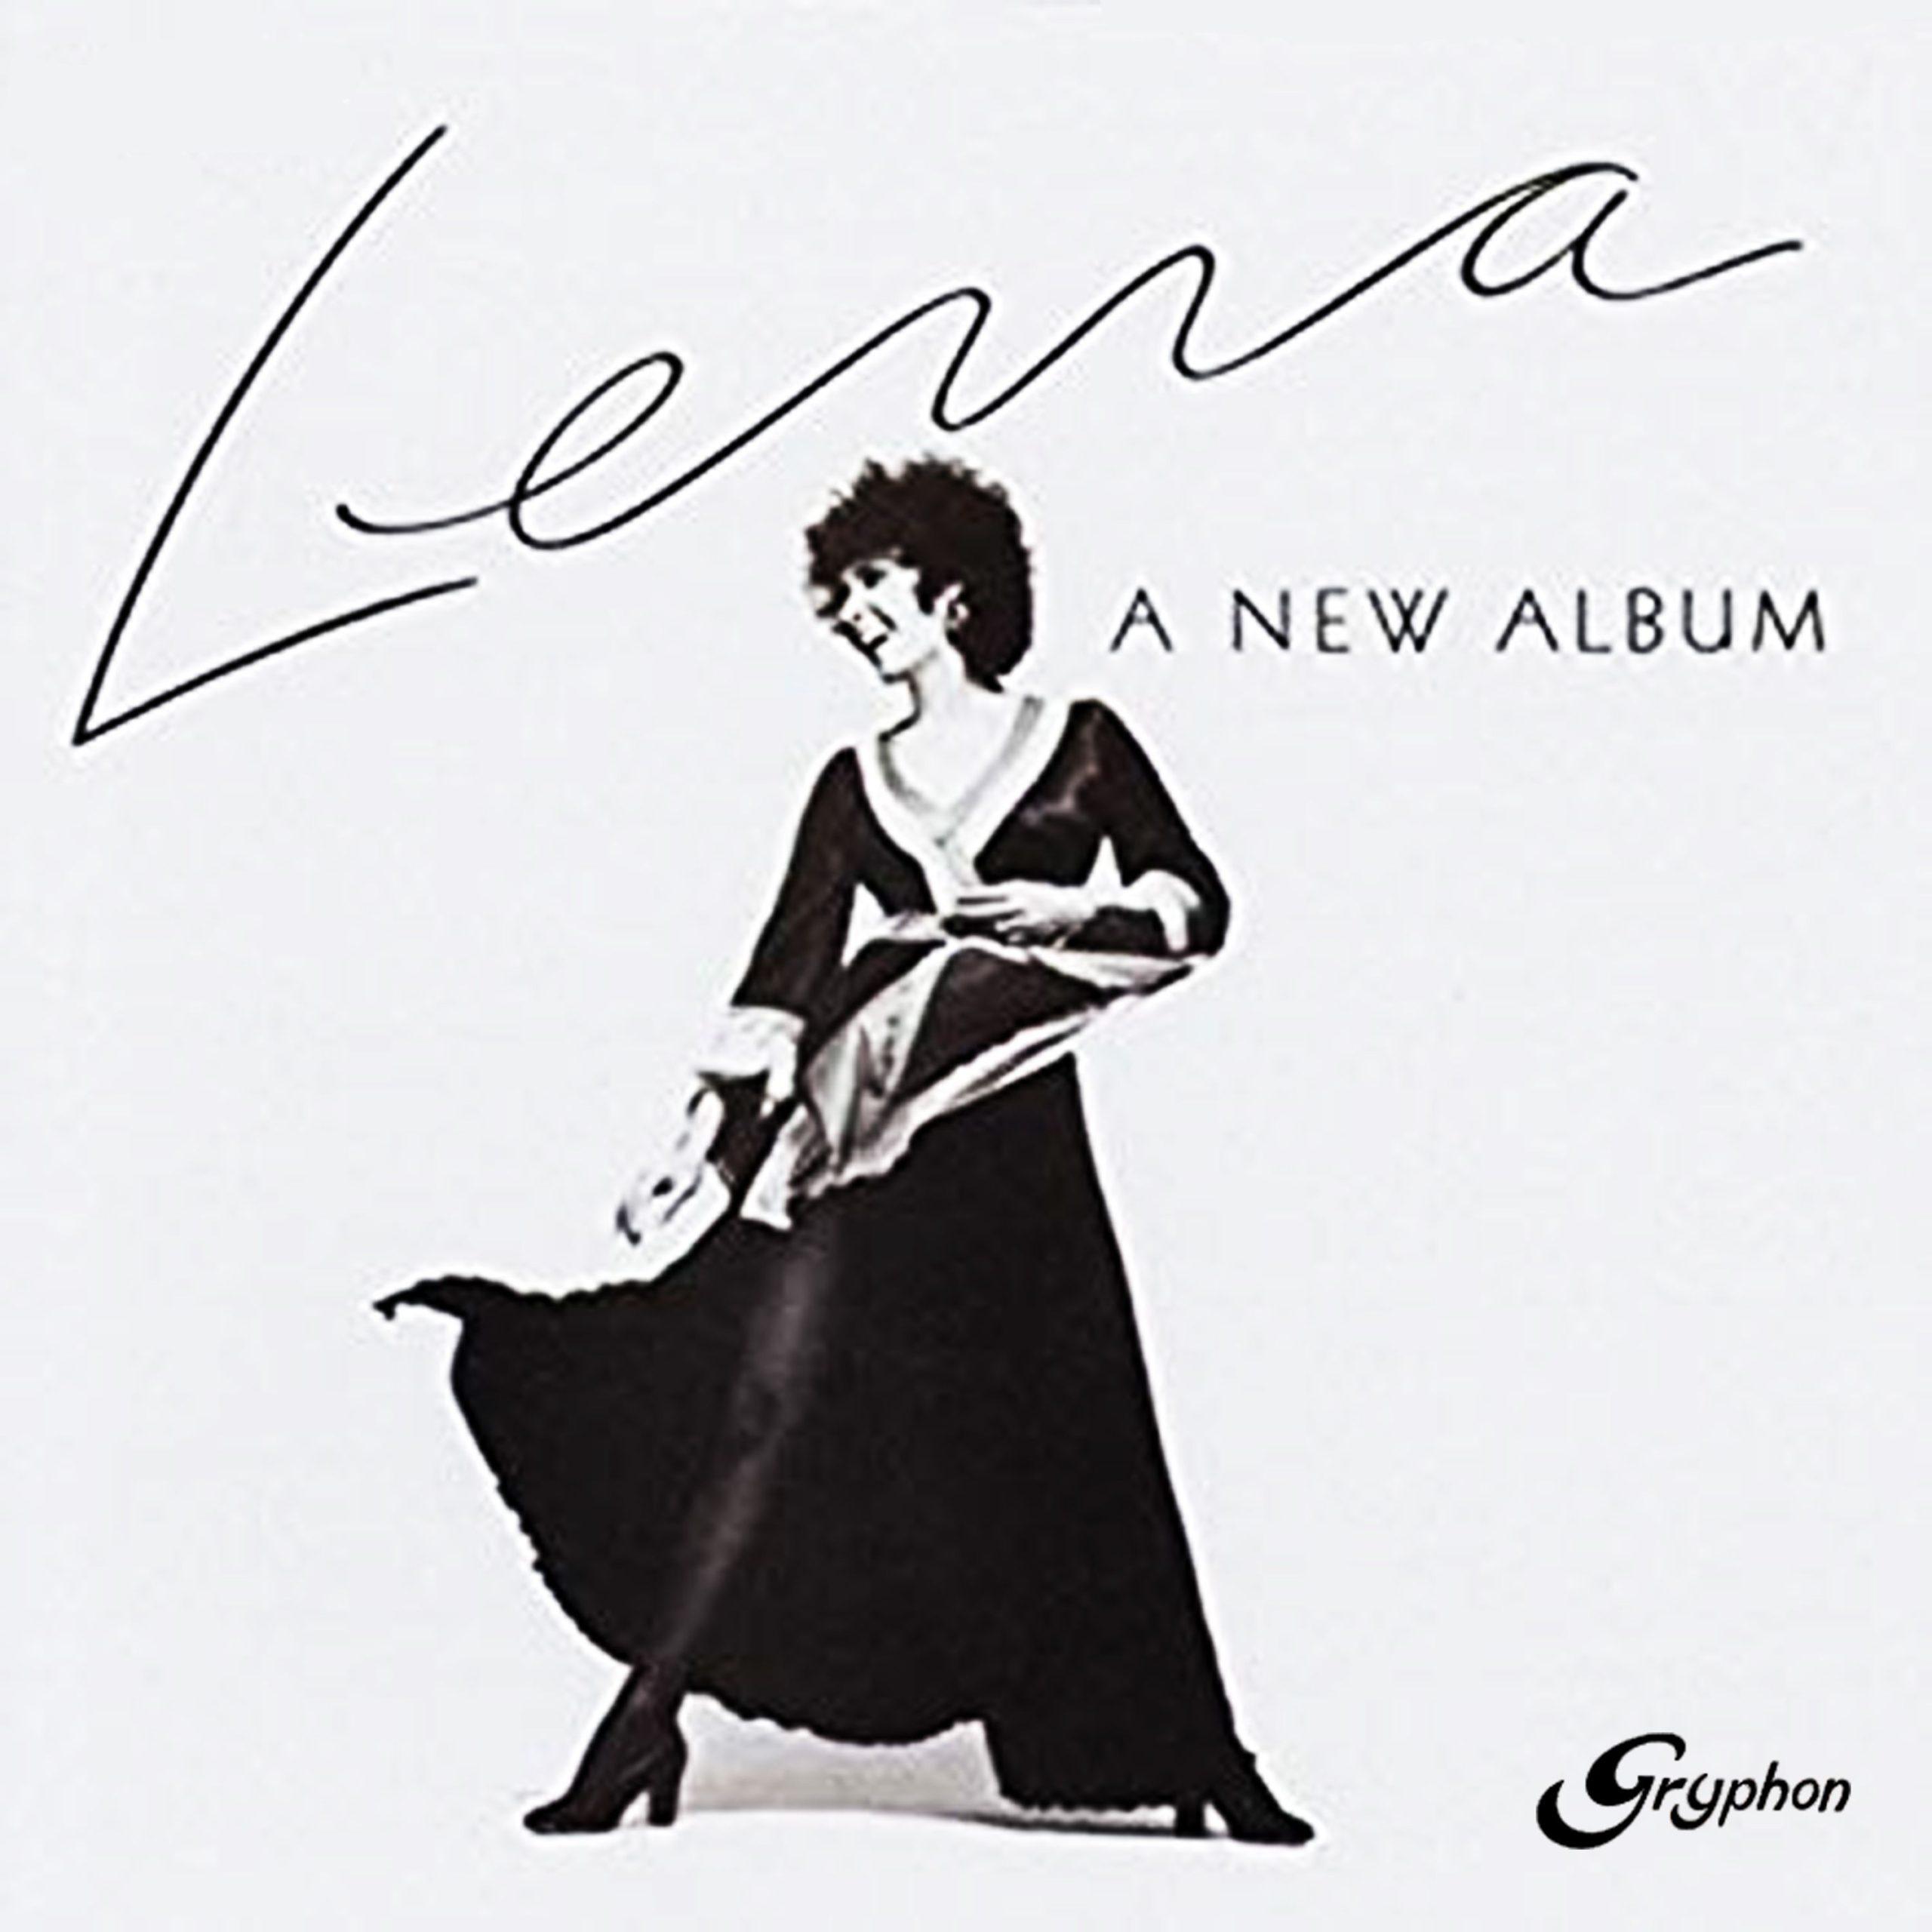 A New Album